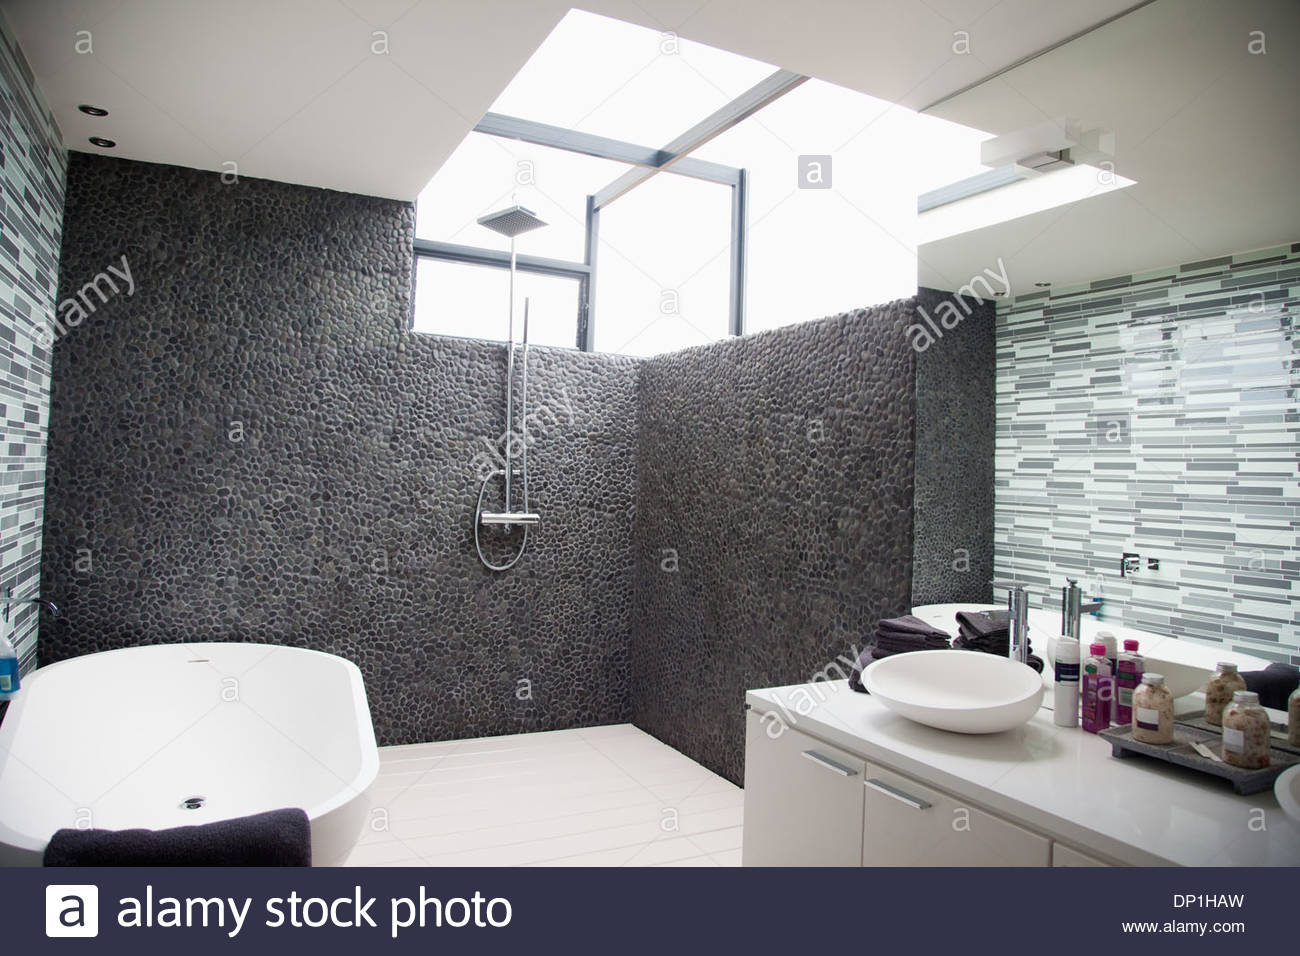 Sonne durch die Fenster im modernen Badezimmer Stockbild